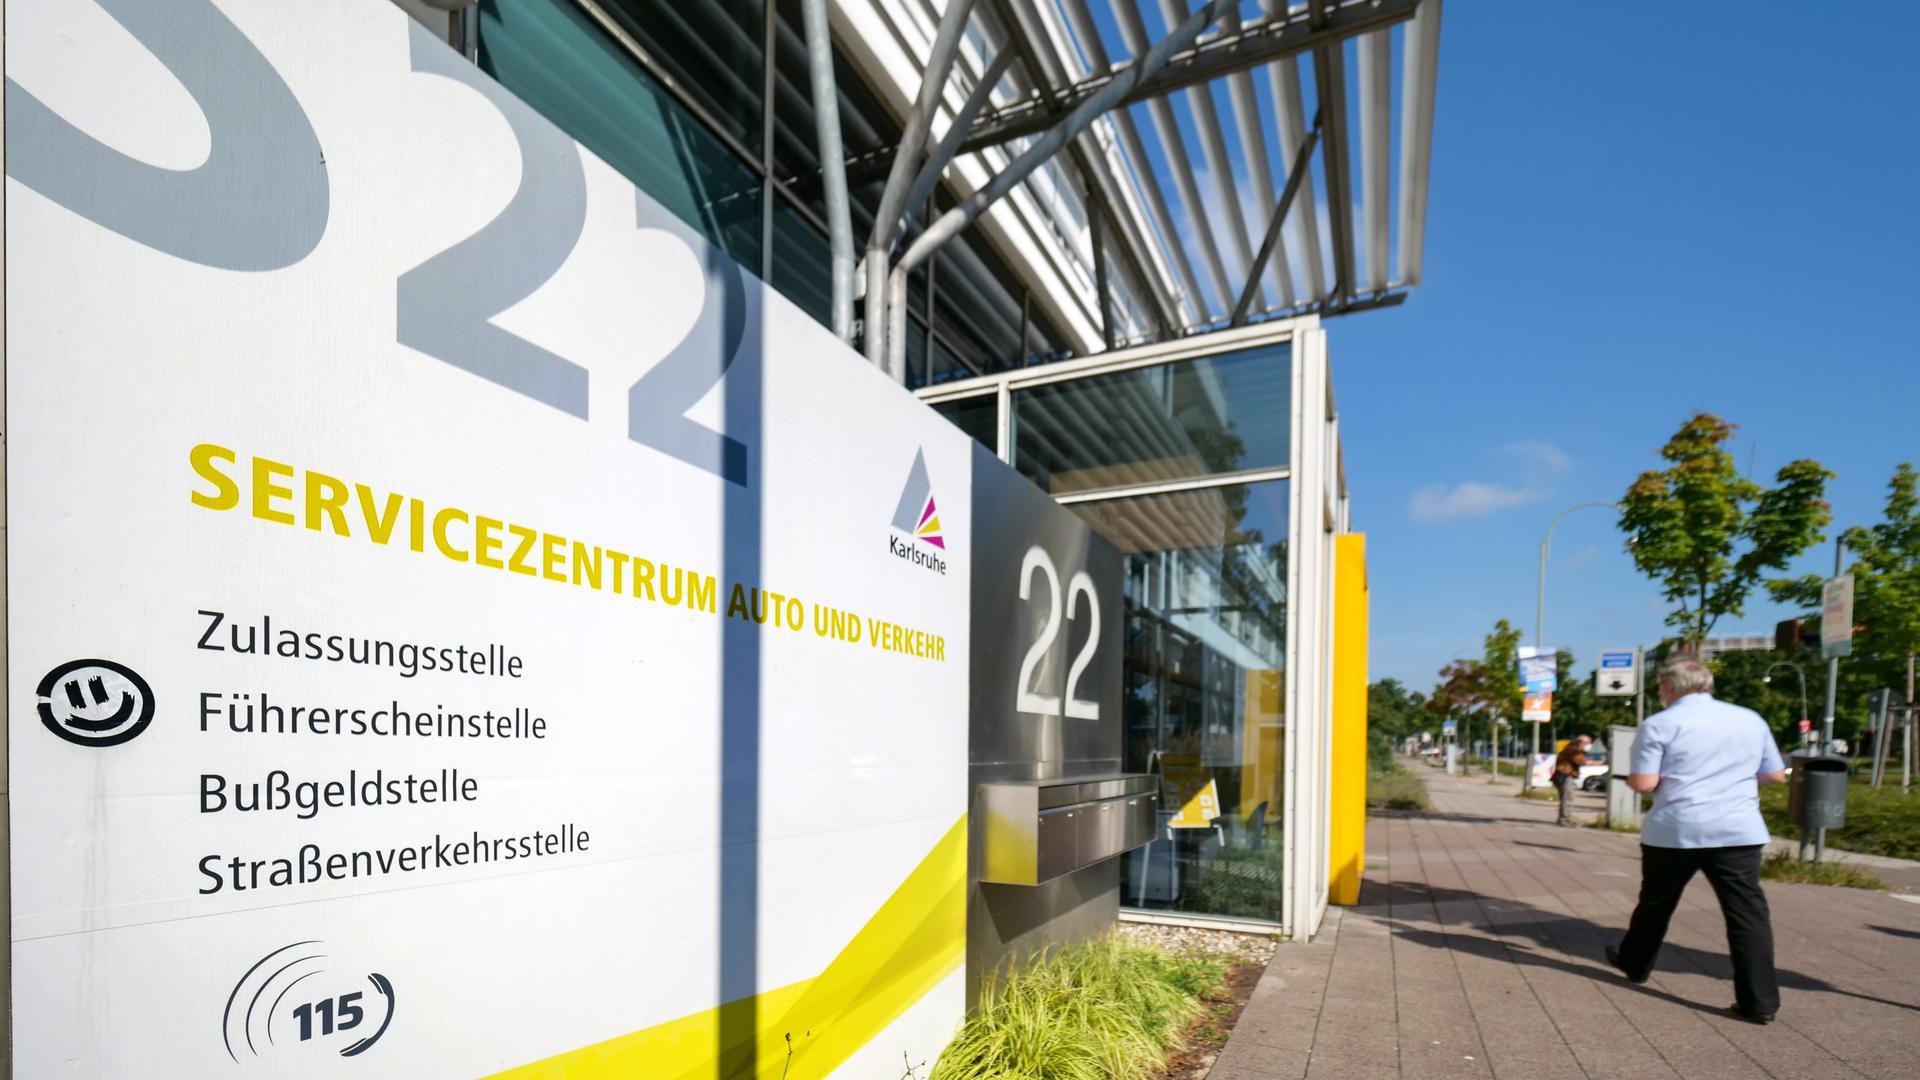 Zulassungsstelle Karlsruhe